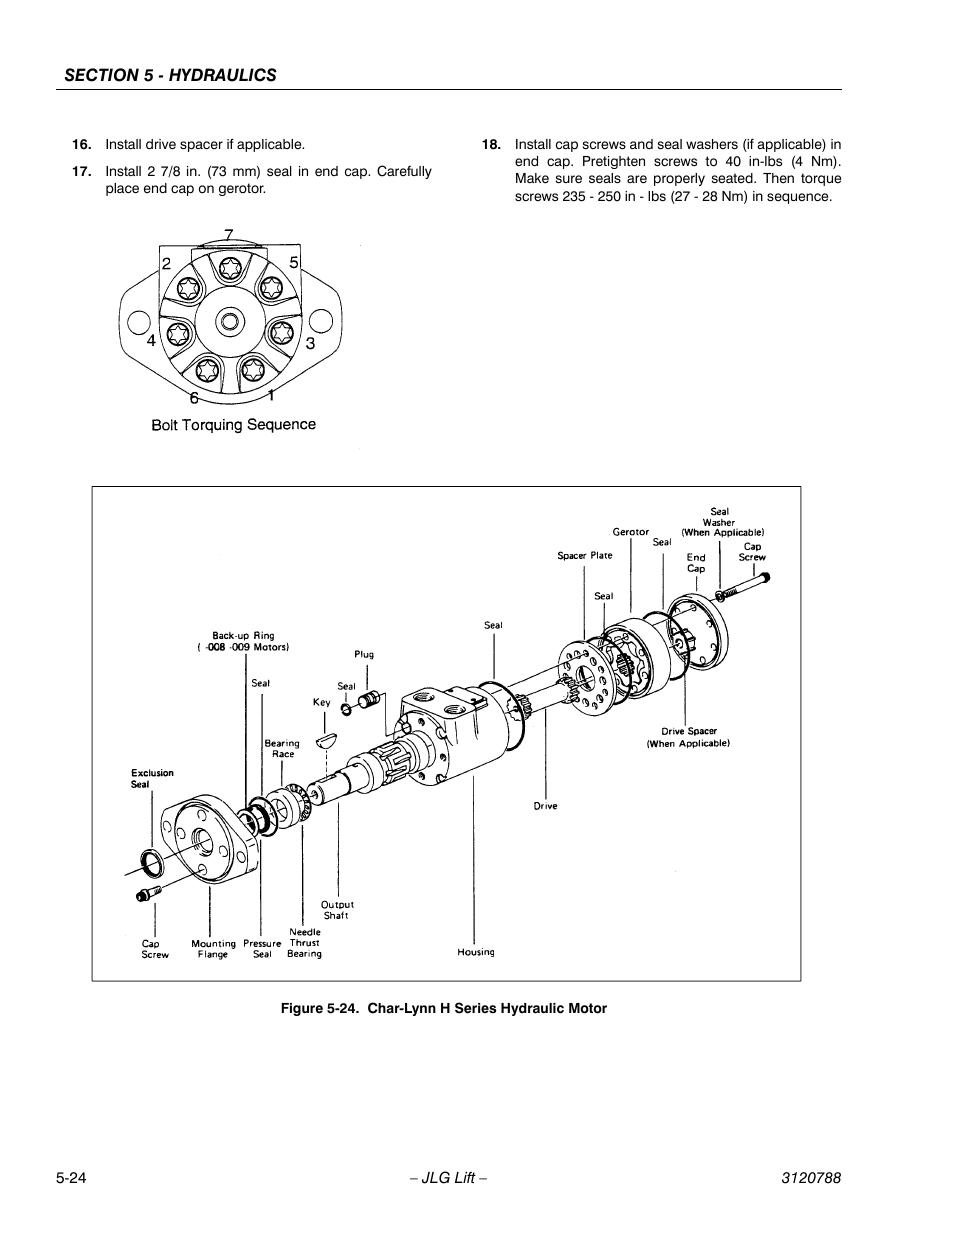 Char-lynn h series hydraulic motor -24 | JLG 460SJ ANSI Service